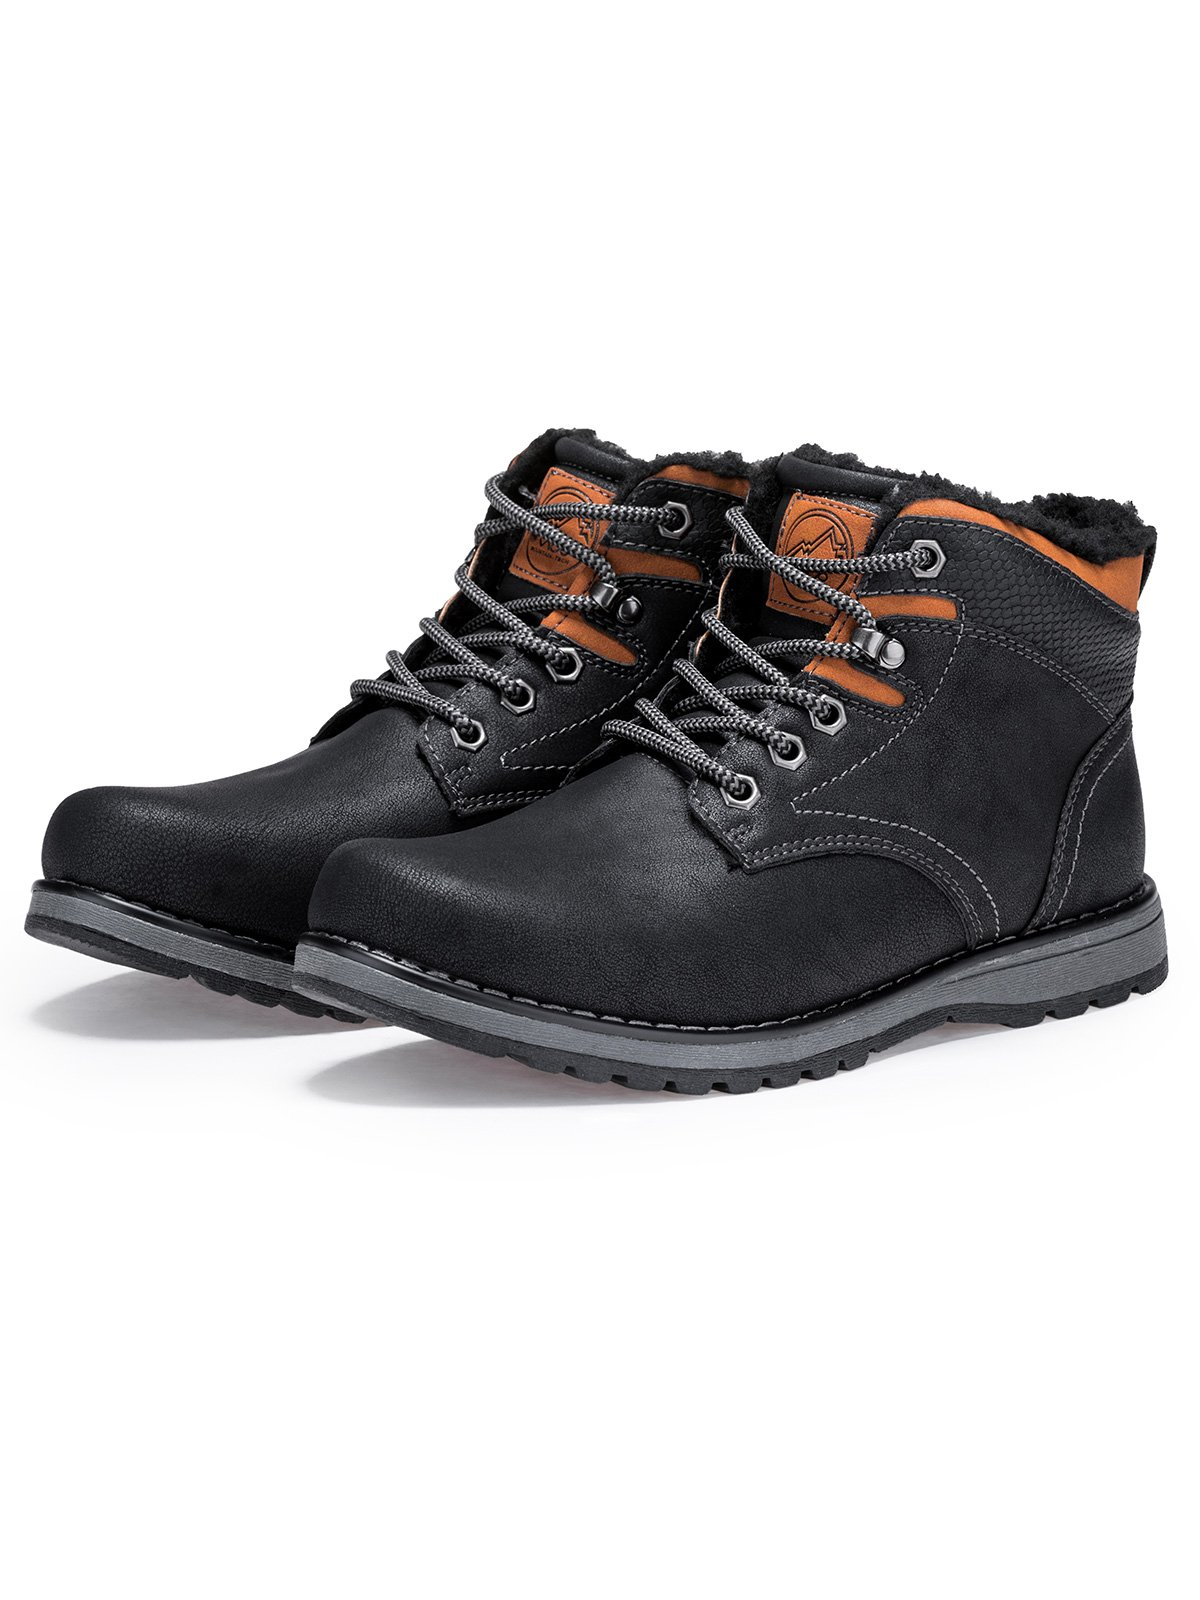 Buty męskie zimowe trapery 252T czarne